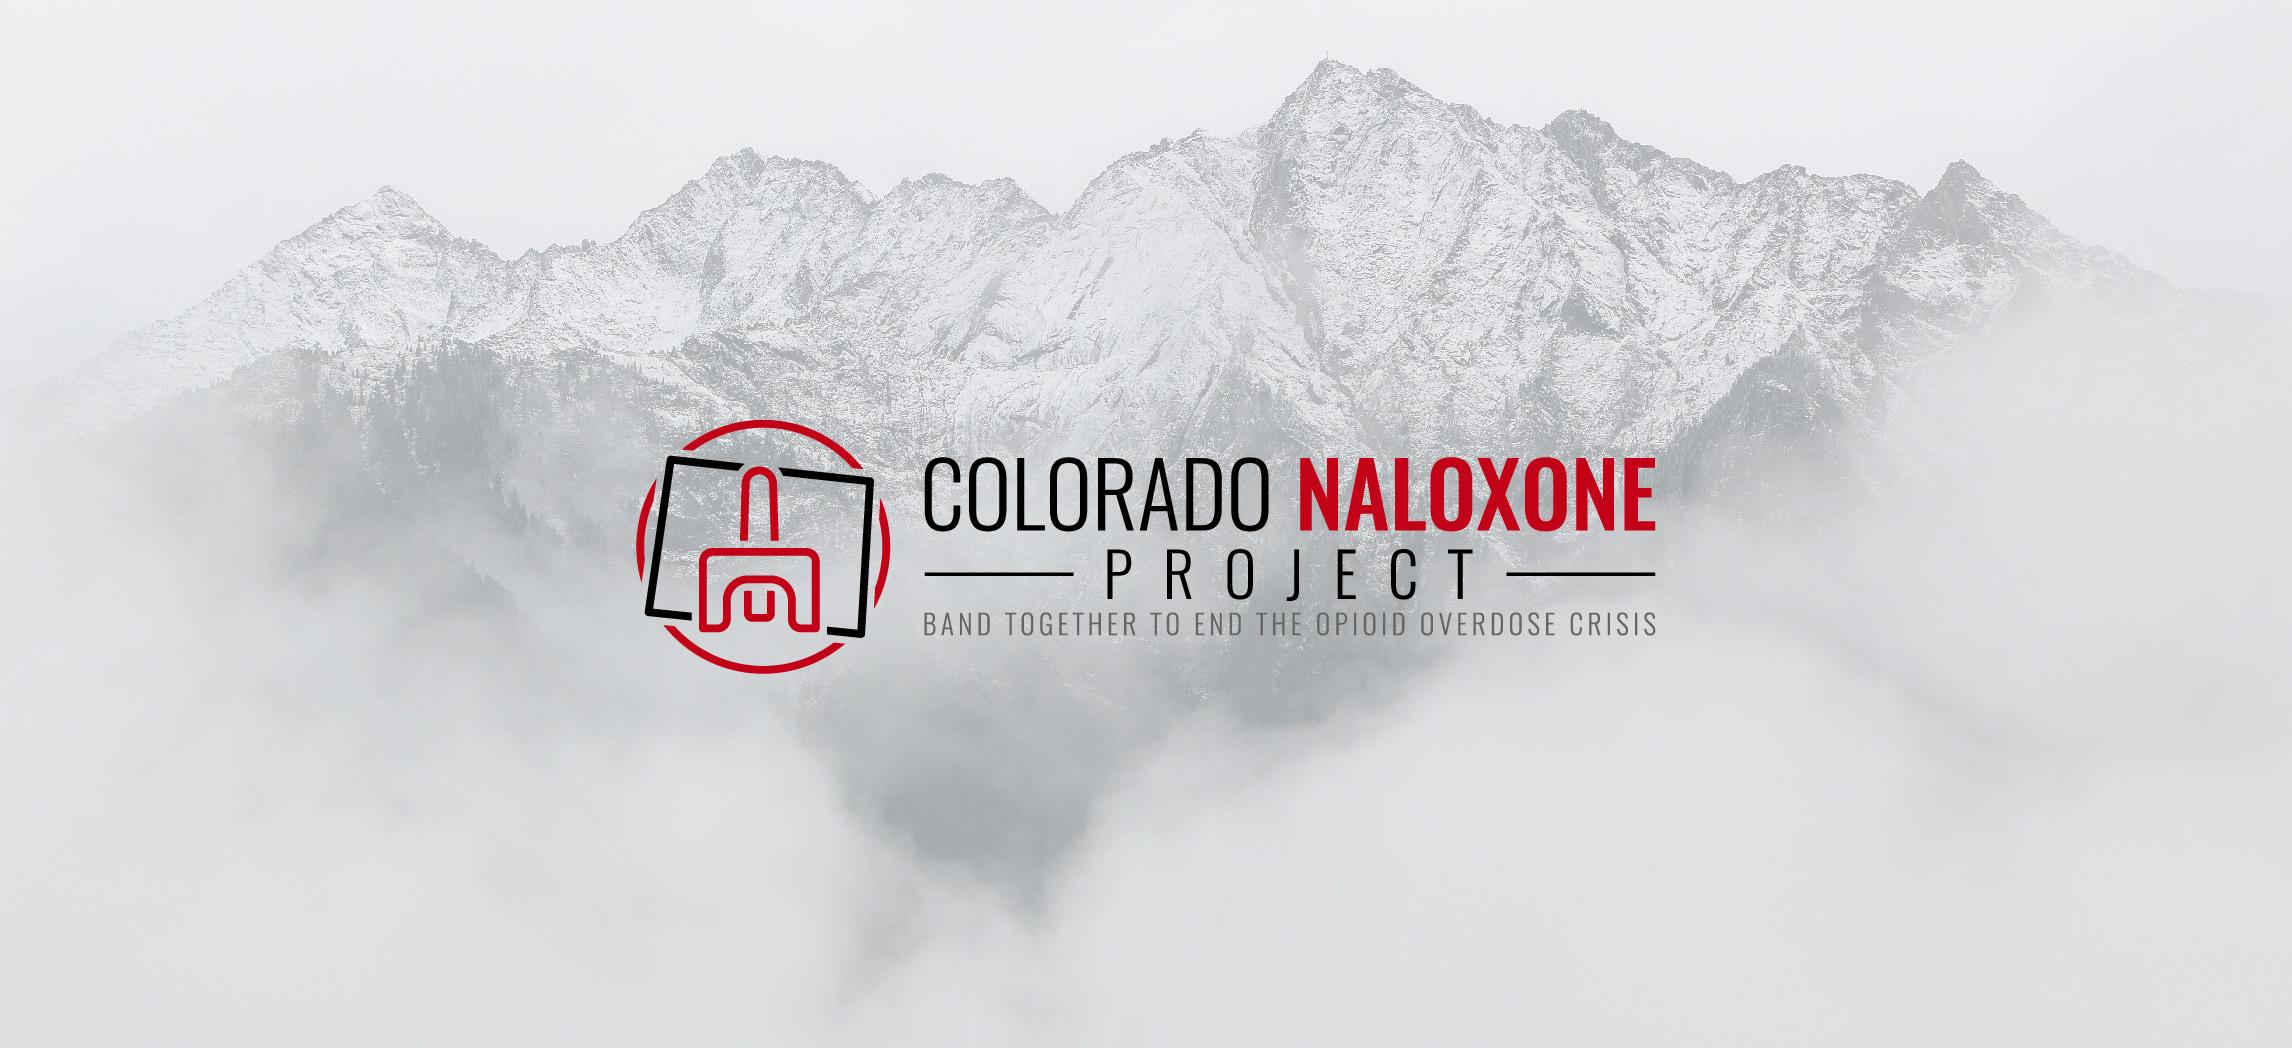 colorado naloxone project images